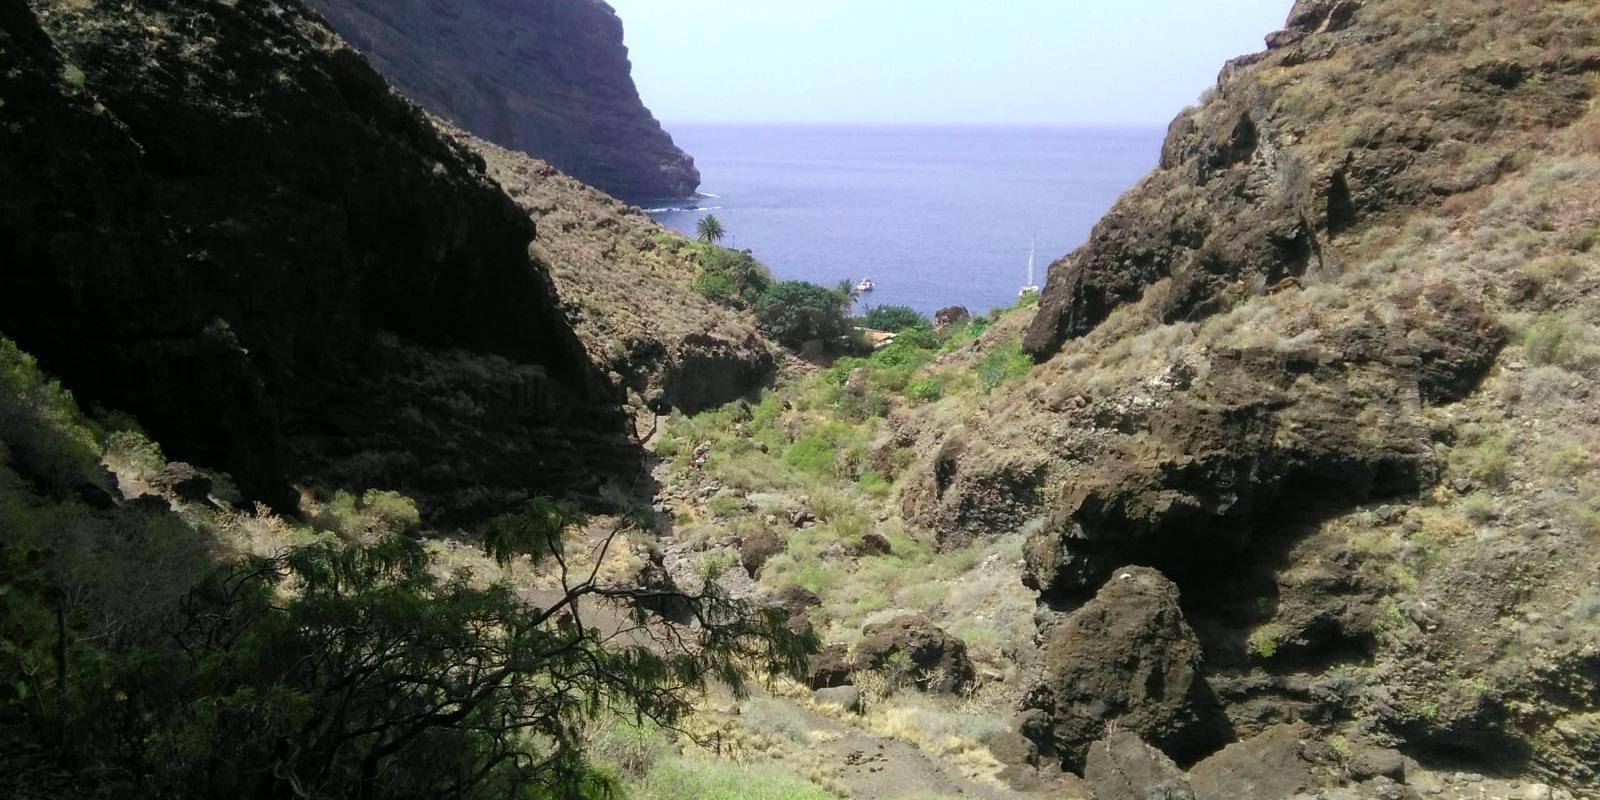 Llegada al mar desde el barranco de Masca